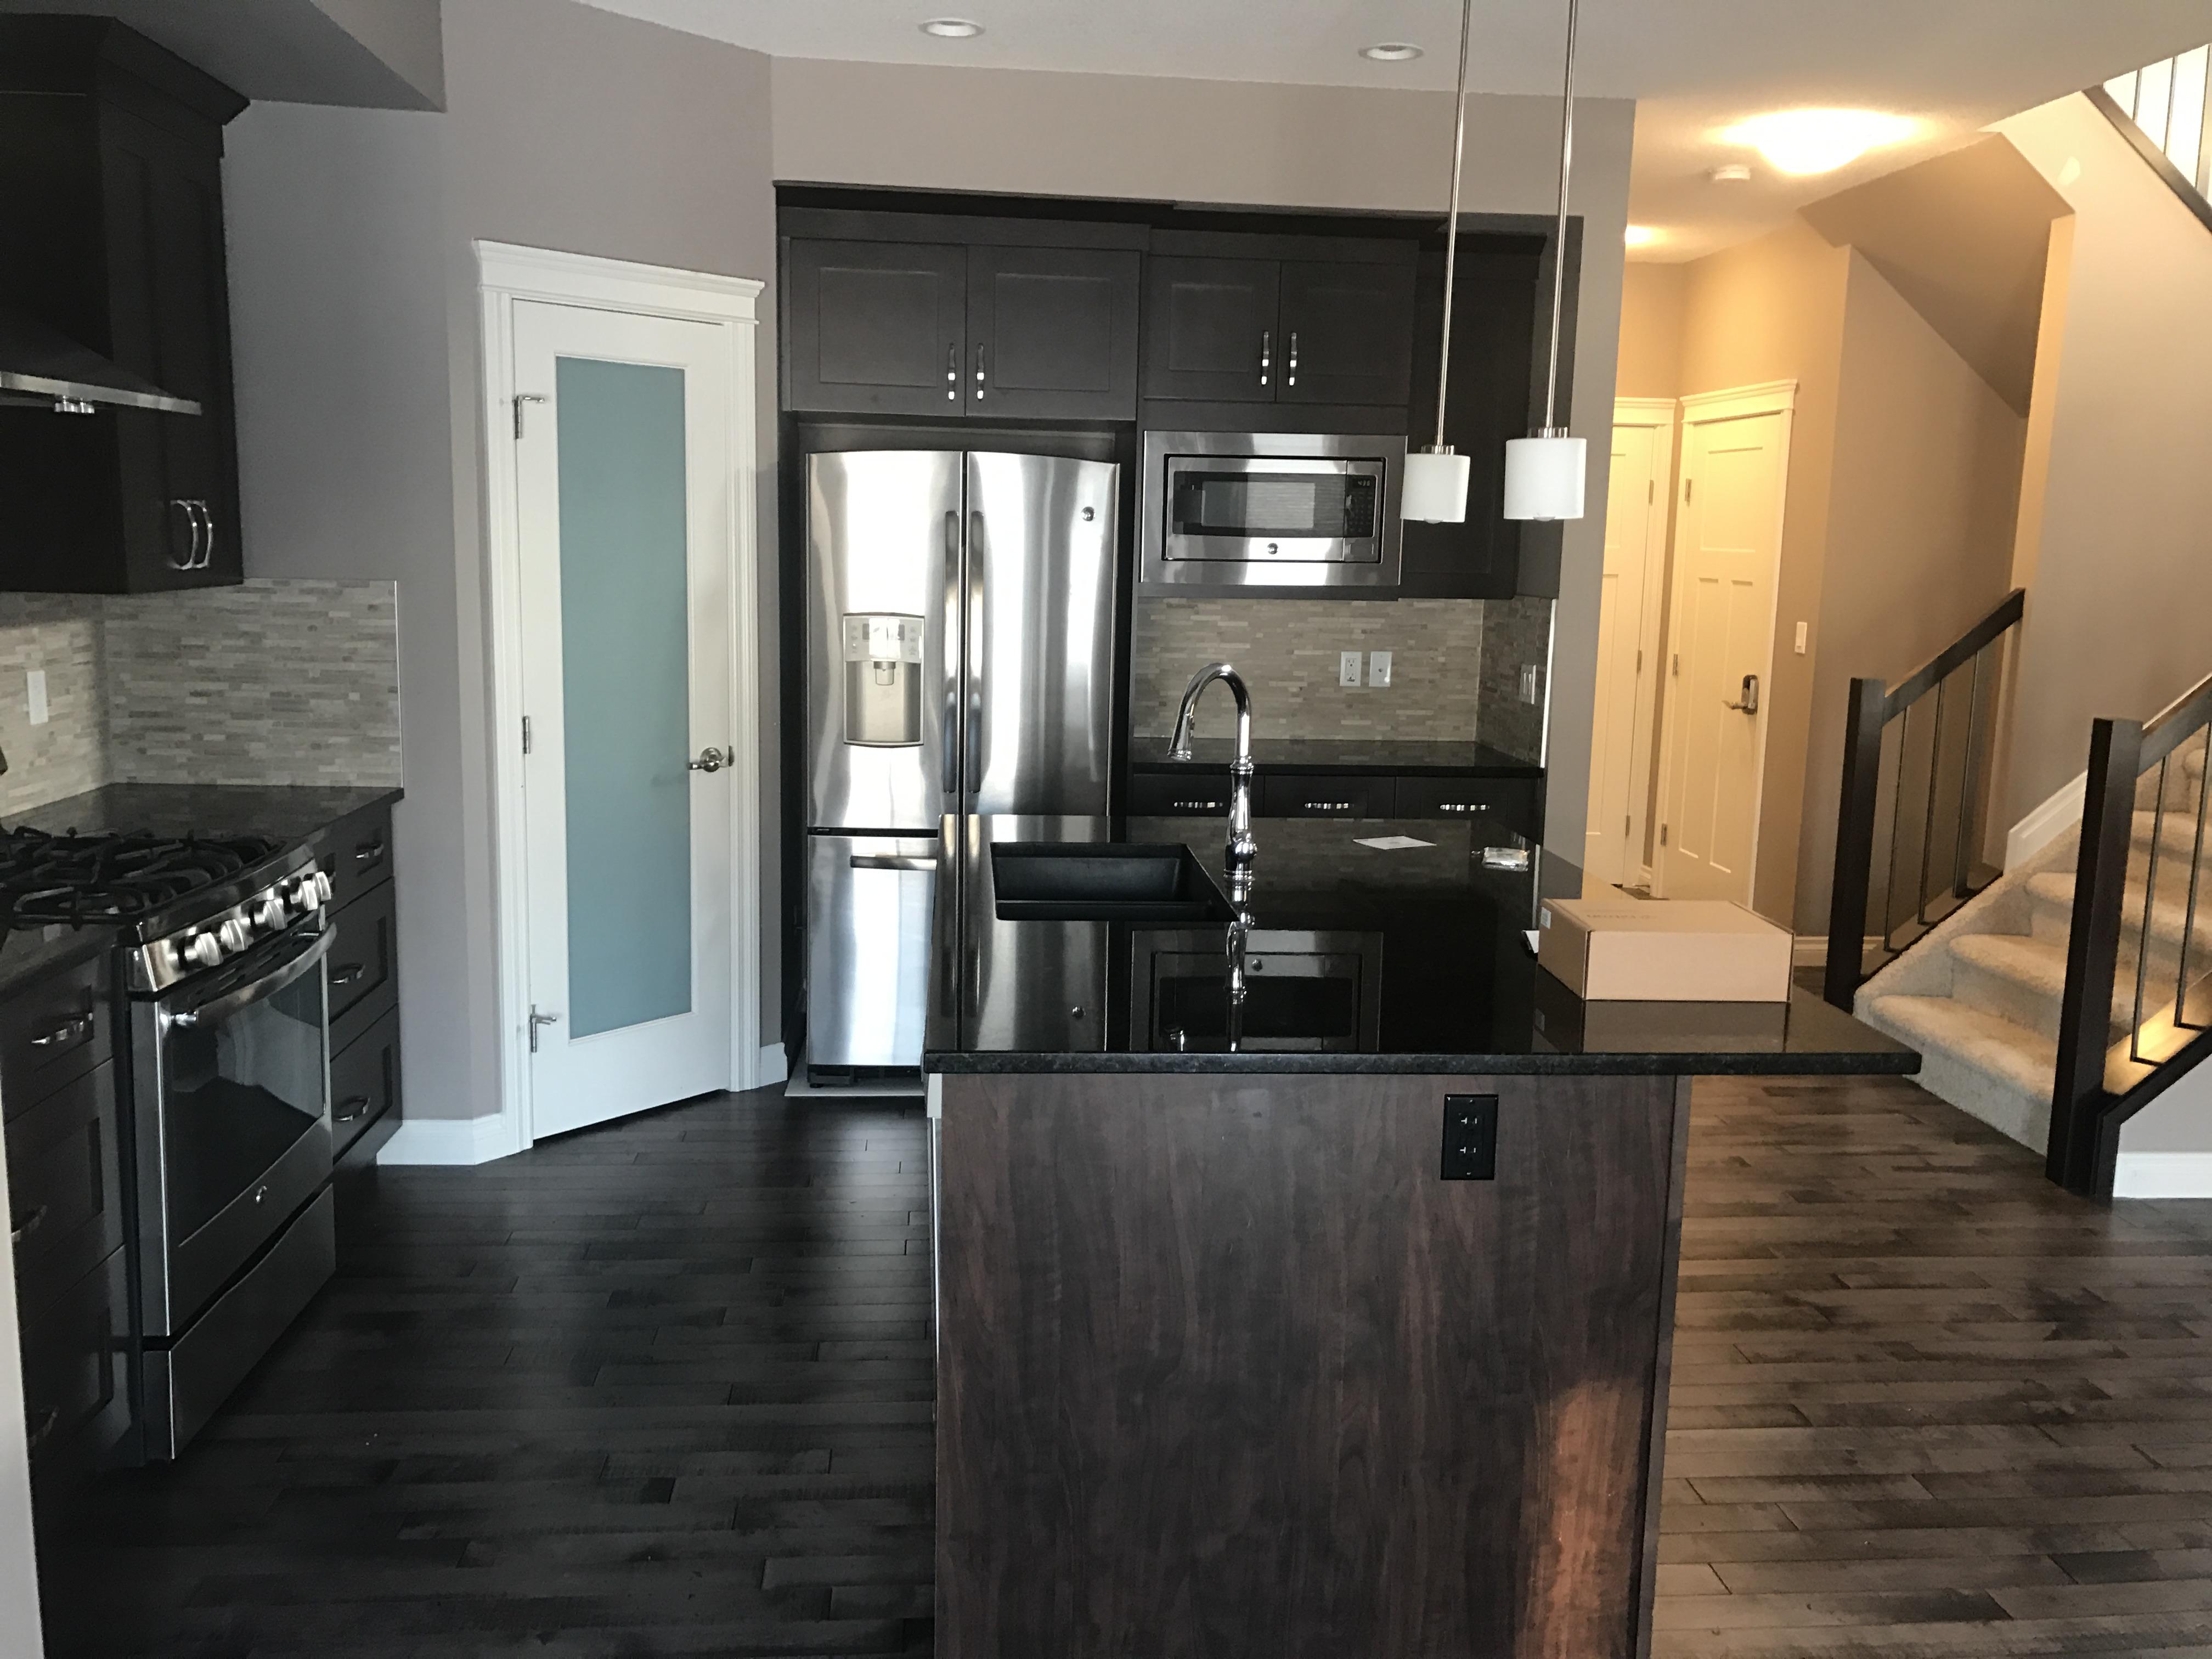 HUGE 3 bedroom 2.5 bath HOME, LEDUC, $1750